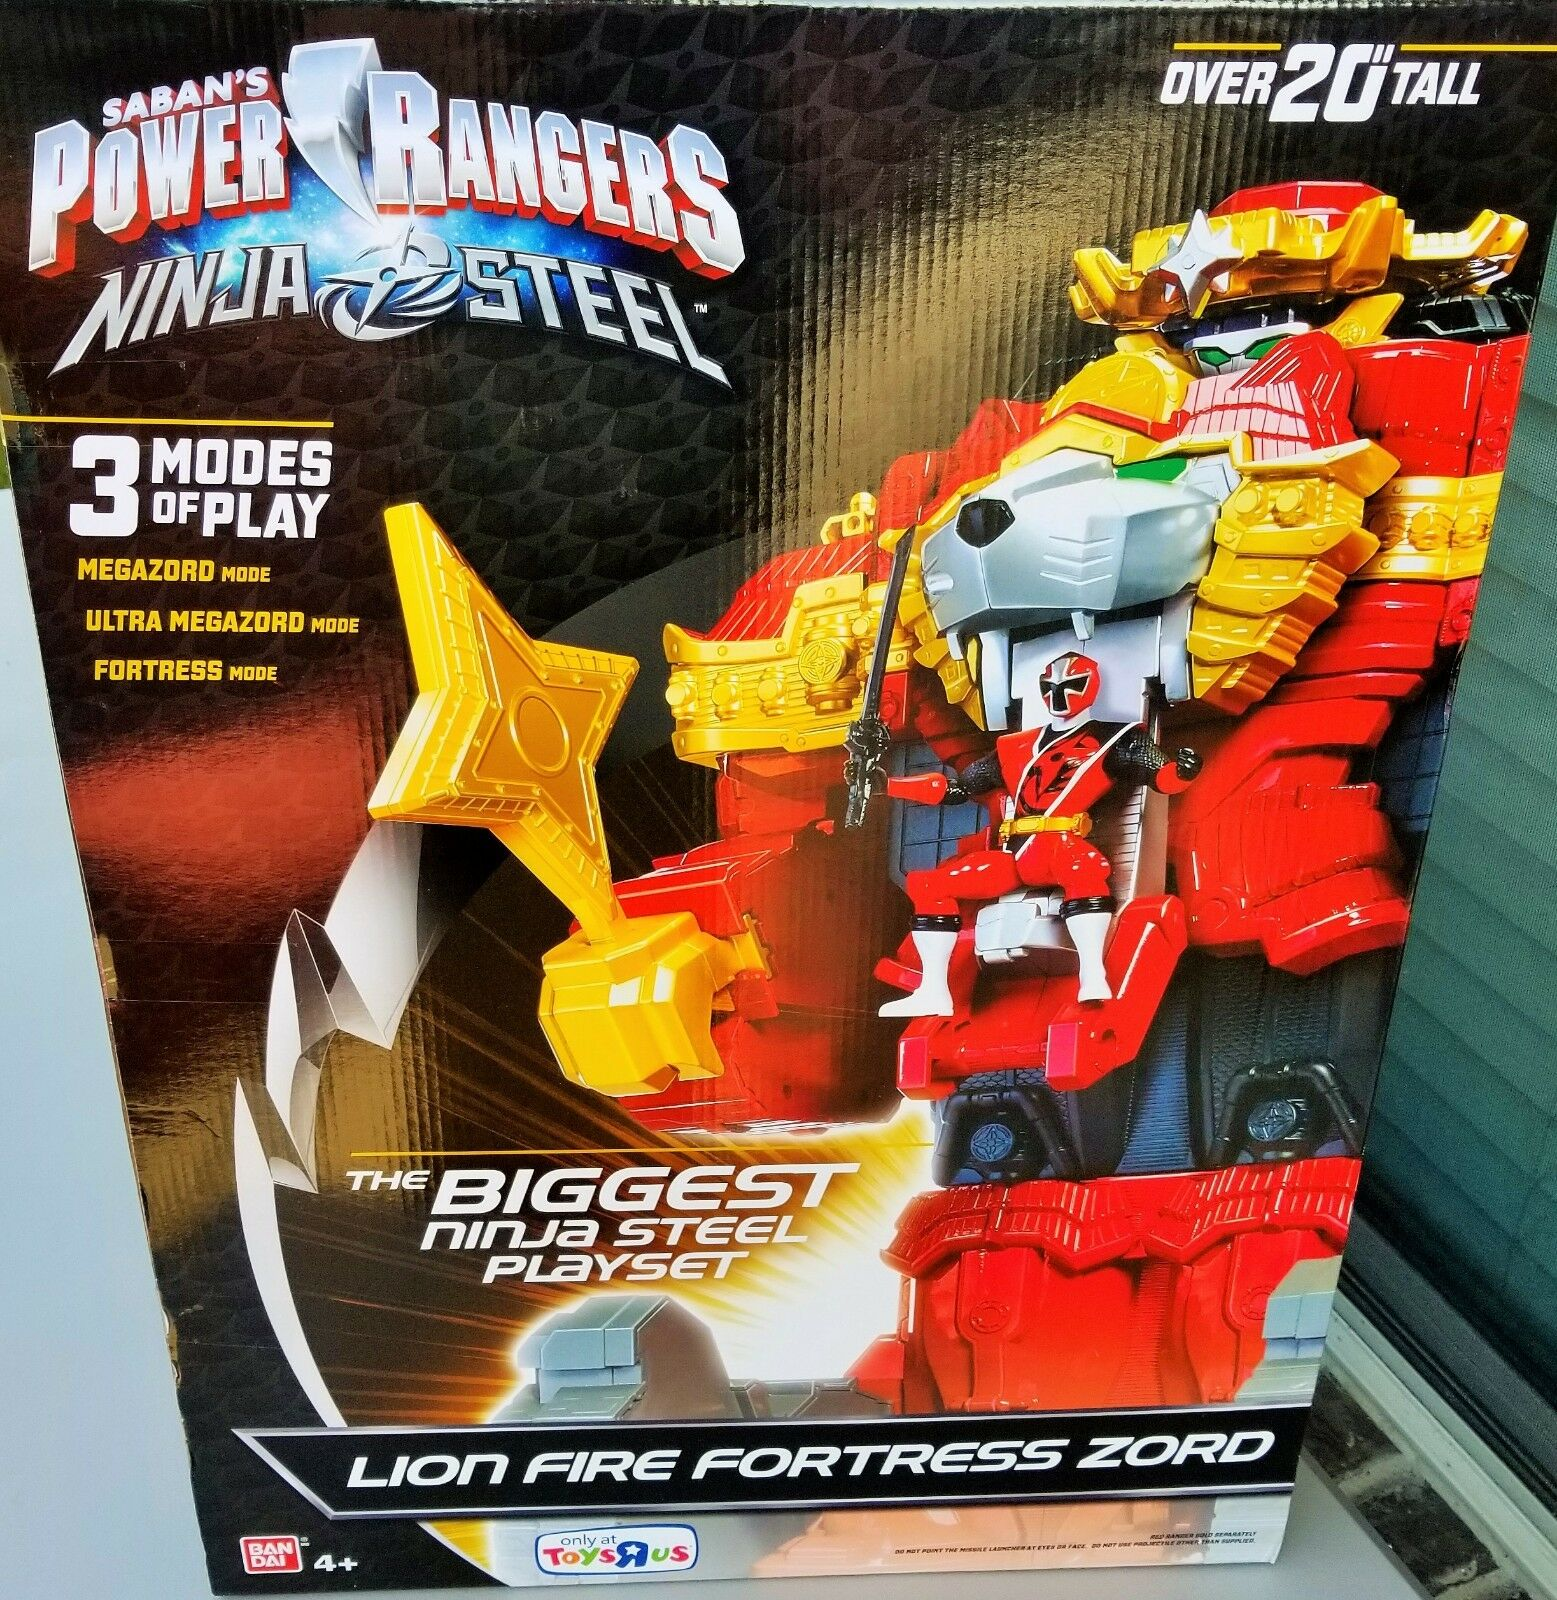 Power rangers ninja - löwe feuer festung zord 20 - zoll - actionfigur playset